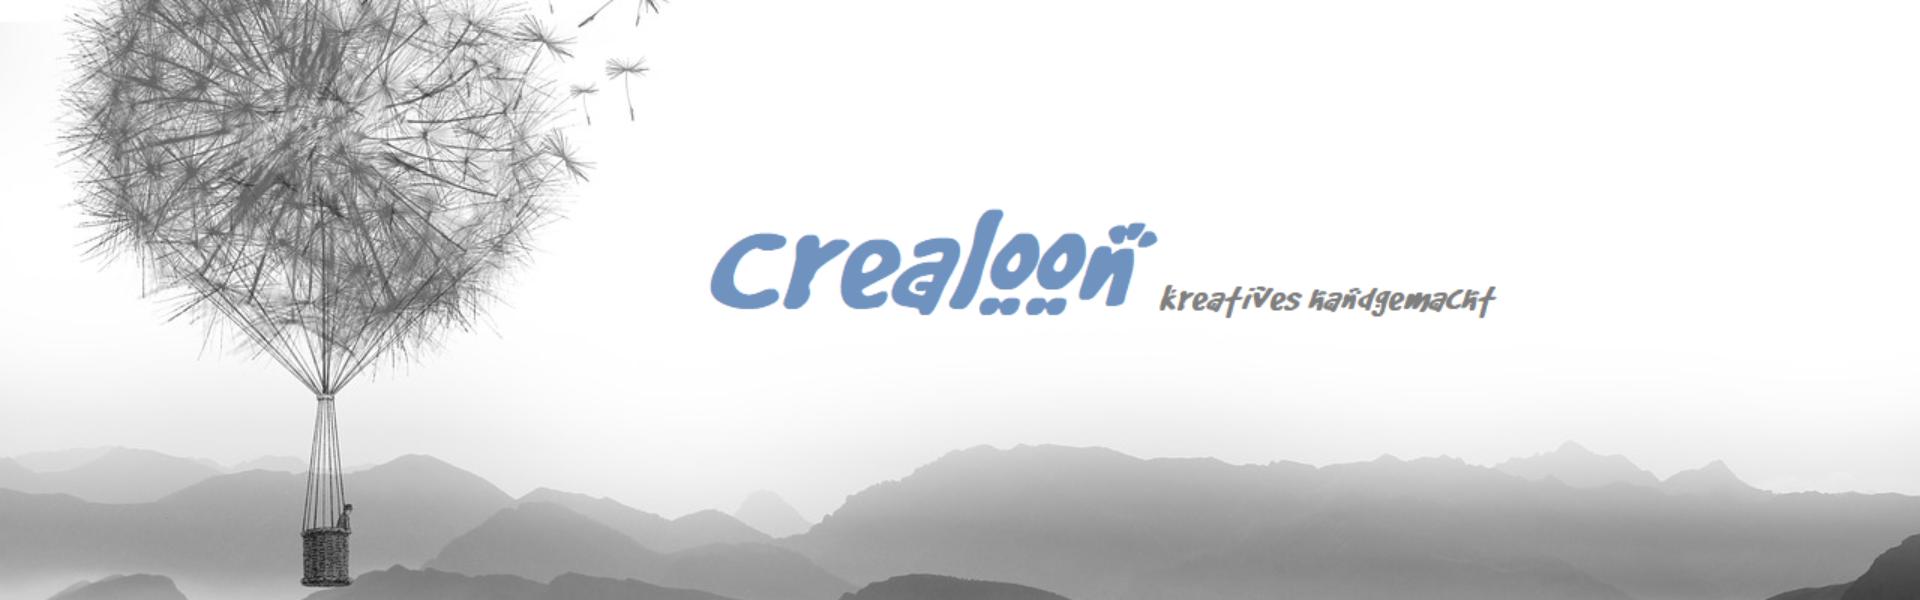 Crealoon